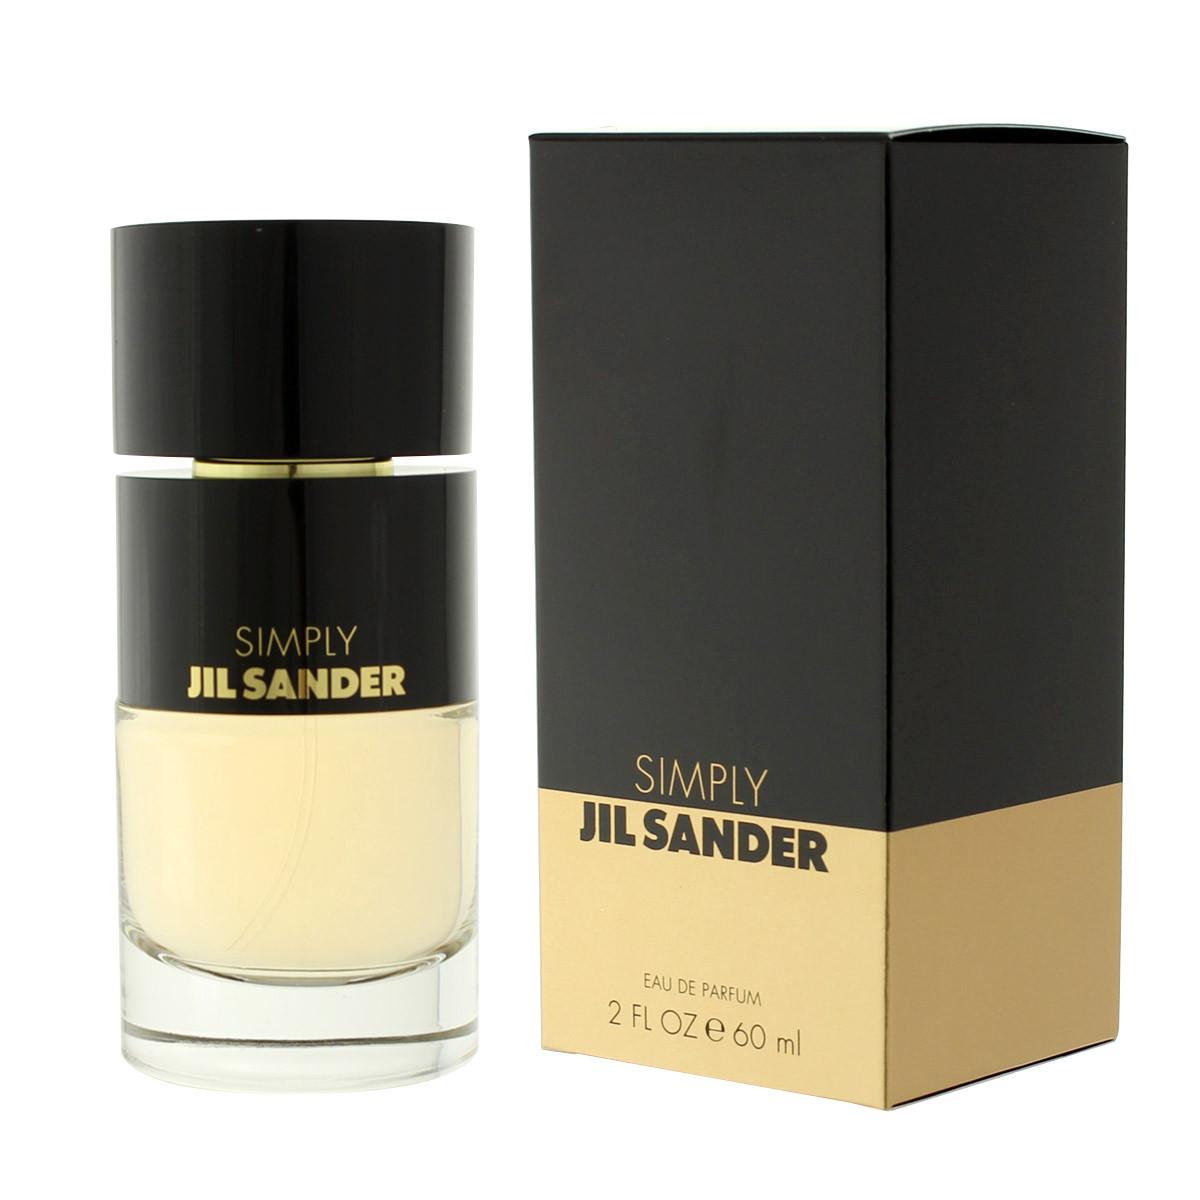 jil sander simply jil sander eau de parfum 60 ml woman. Black Bedroom Furniture Sets. Home Design Ideas